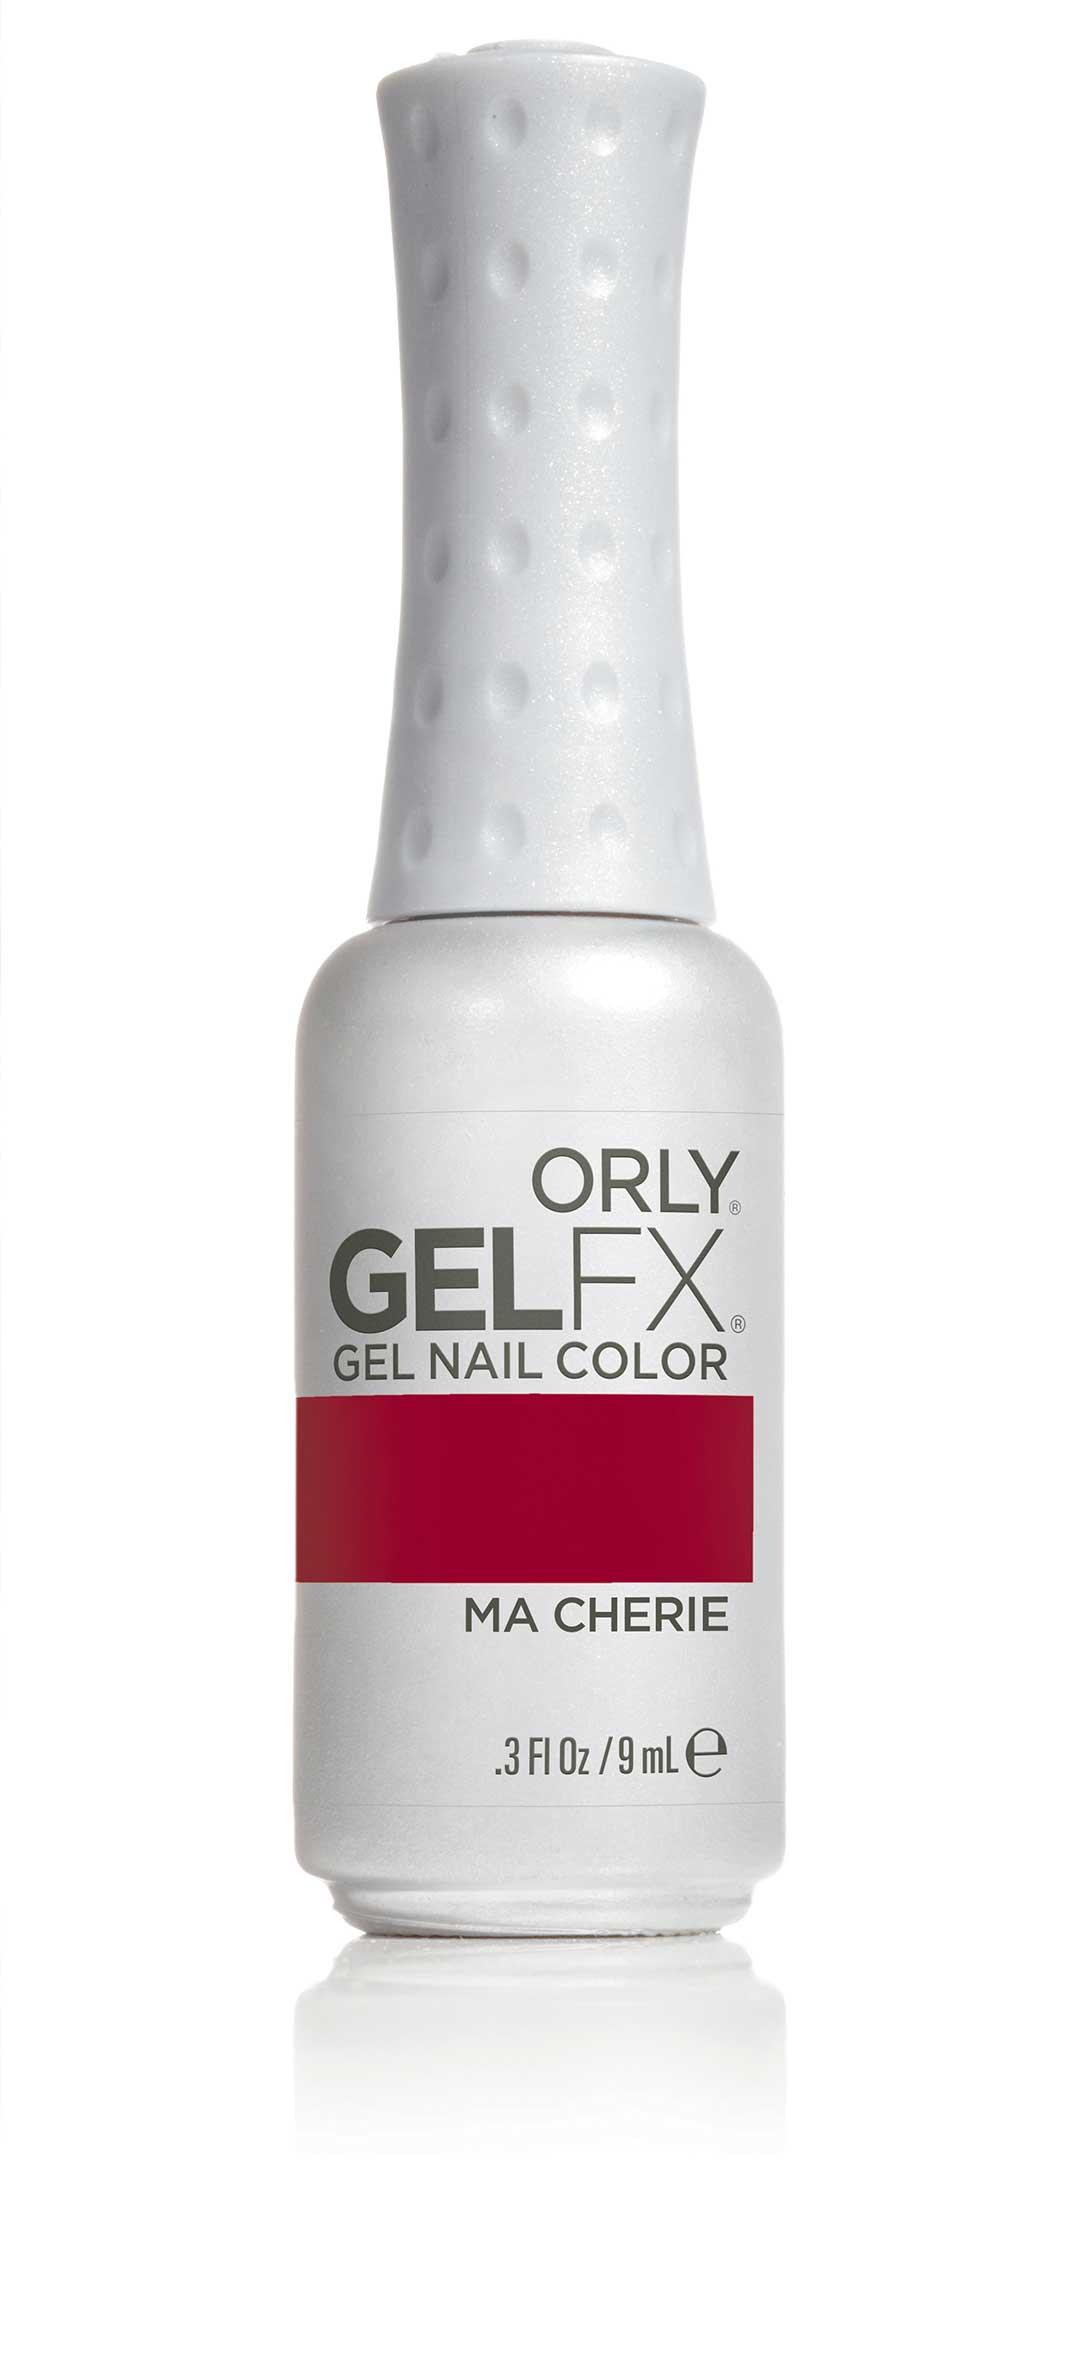 ORLY Гель-лак 25 MA CHERIE / GEL FX 9мл orly гель лак 31 rockin' amber flakie gel fx 9мл